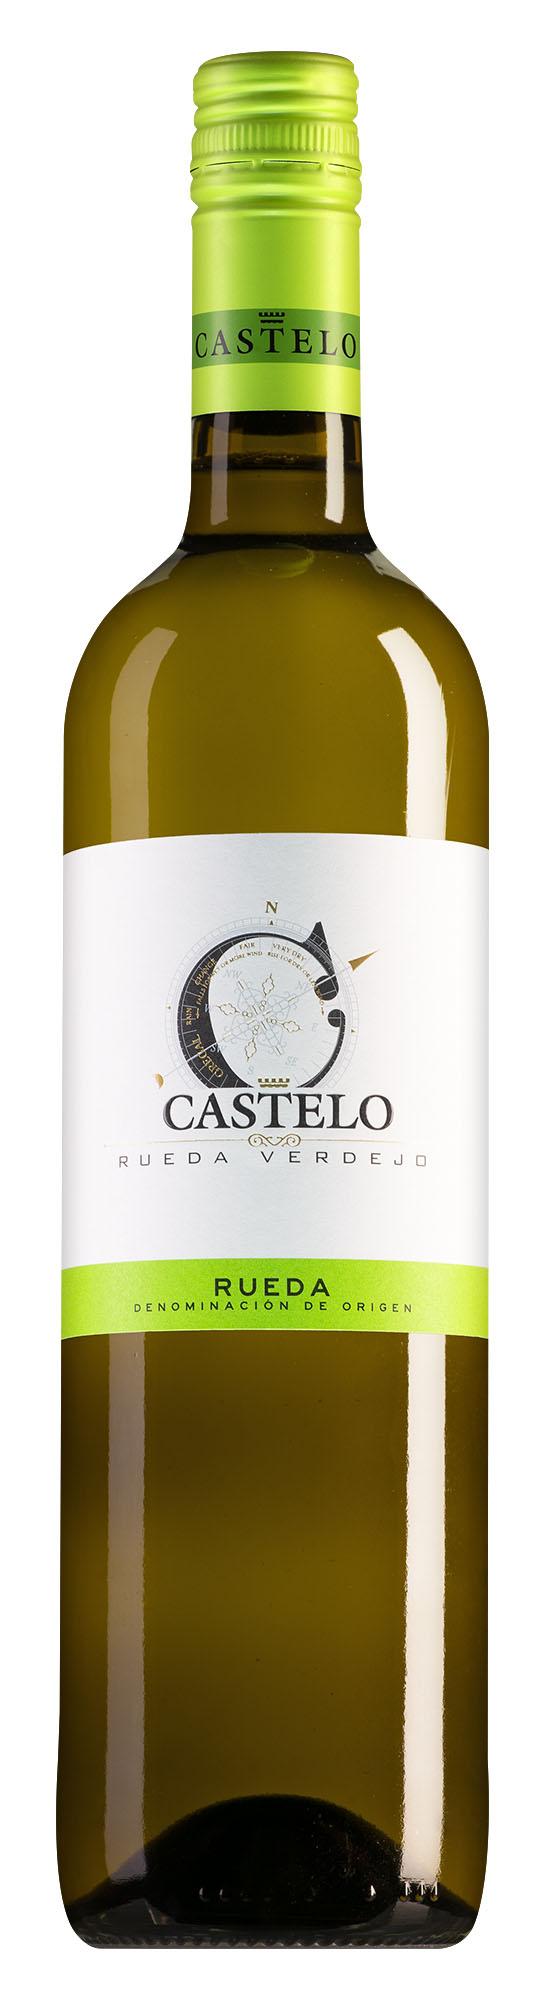 Castelo de Medina Rueda Castelo Green Label Verdejo